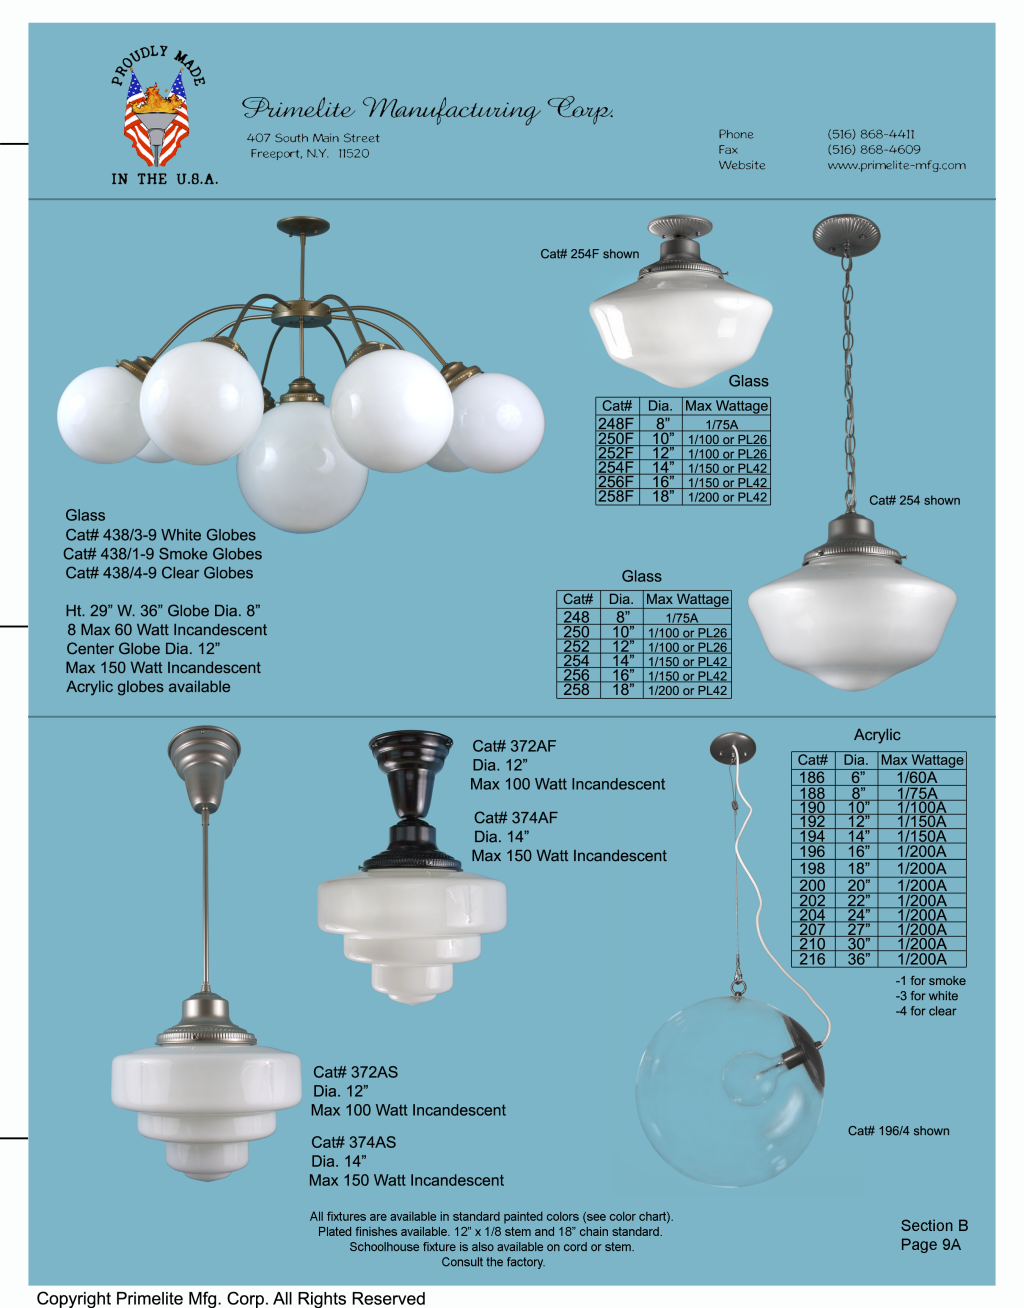 Primelite Catalog Section B – Primelite Manufacturing